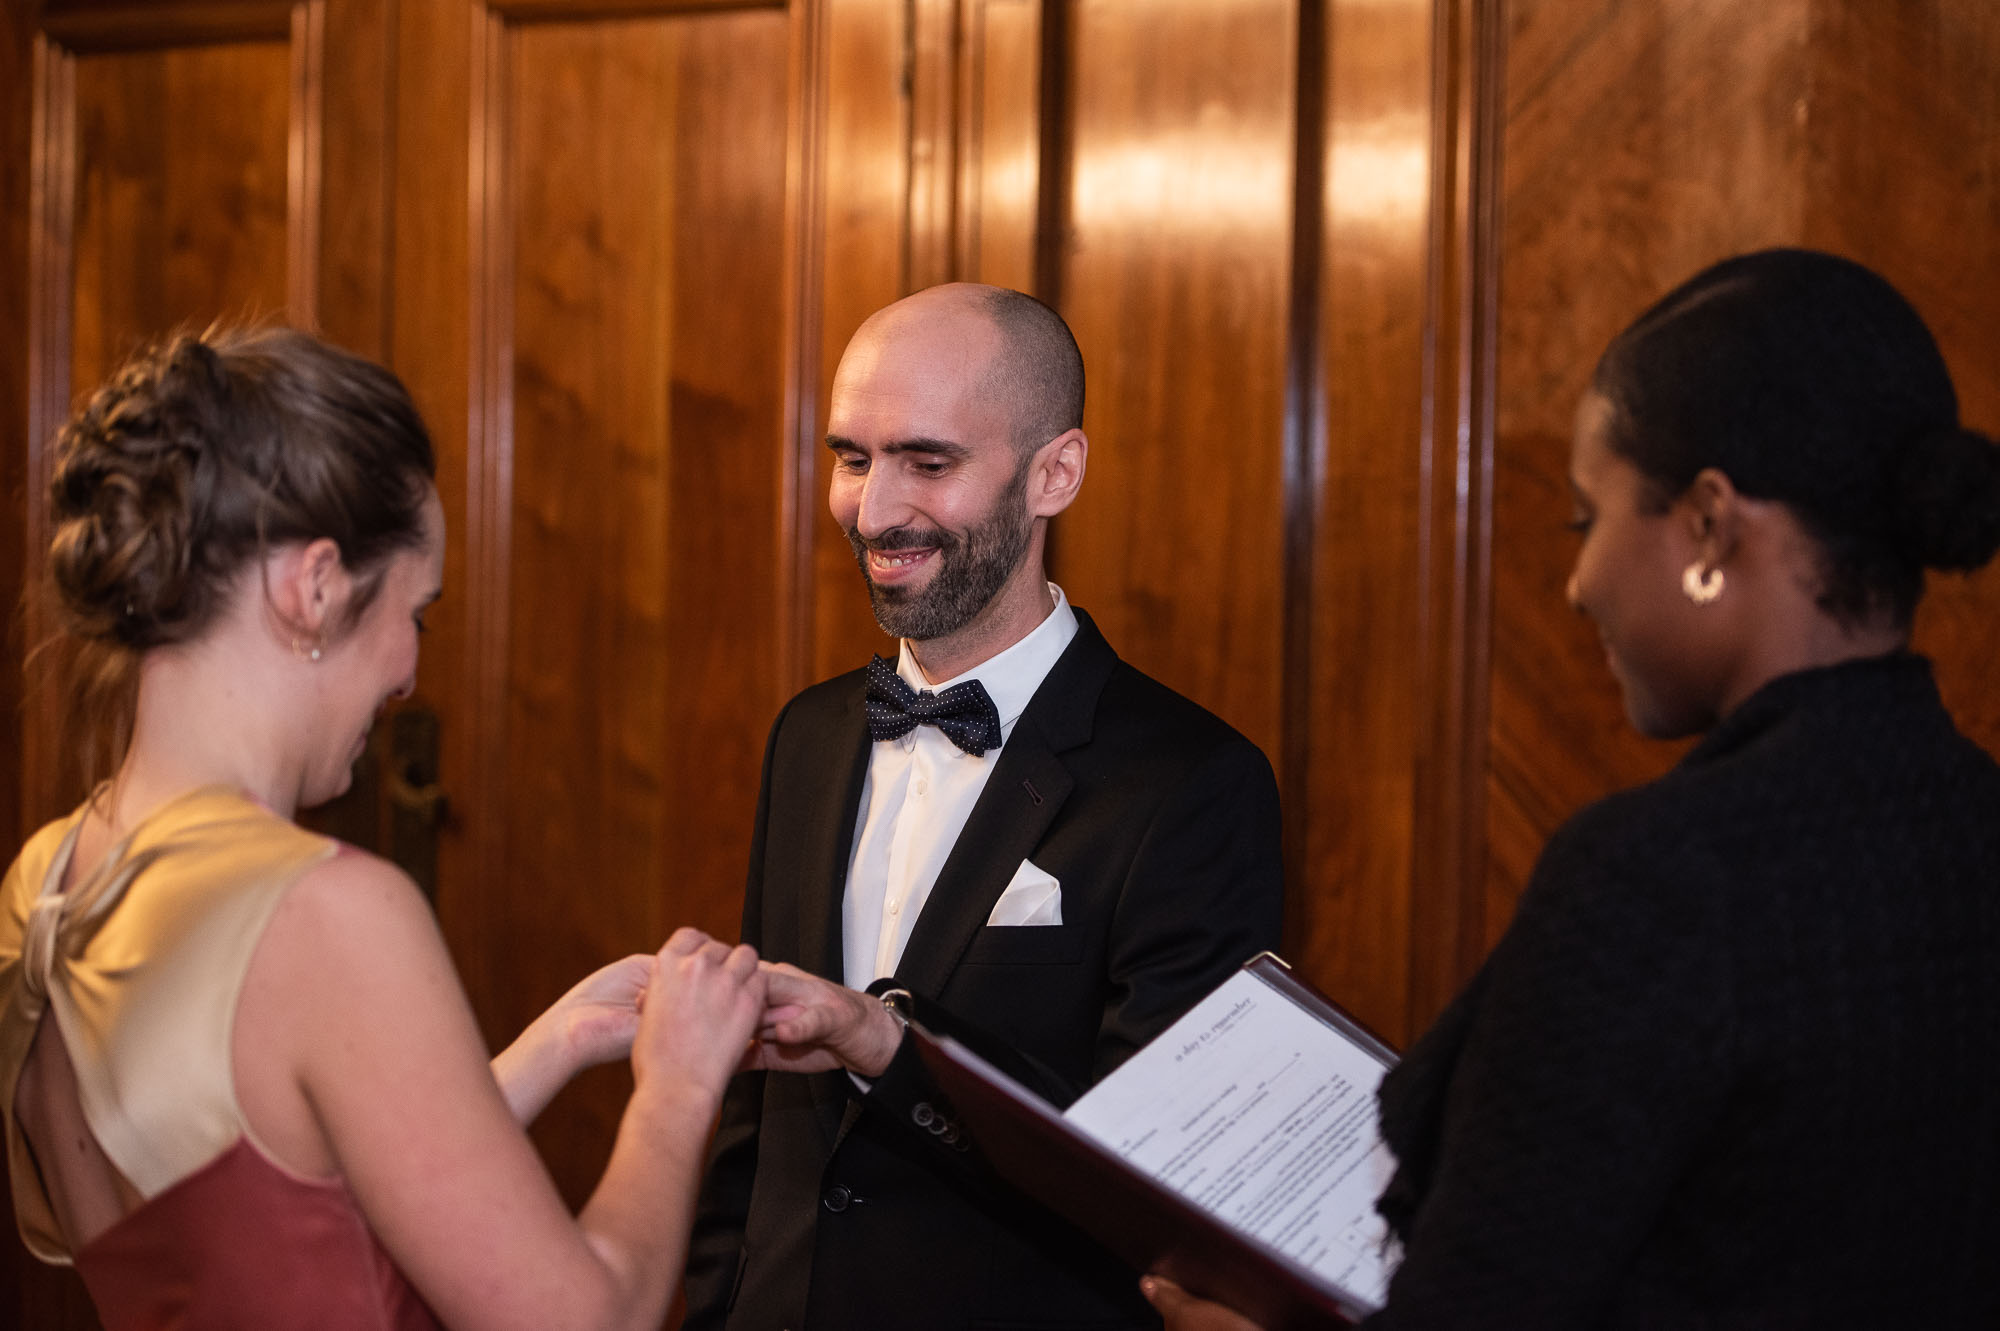 Our Wedding_HR (141 of 176).jpg